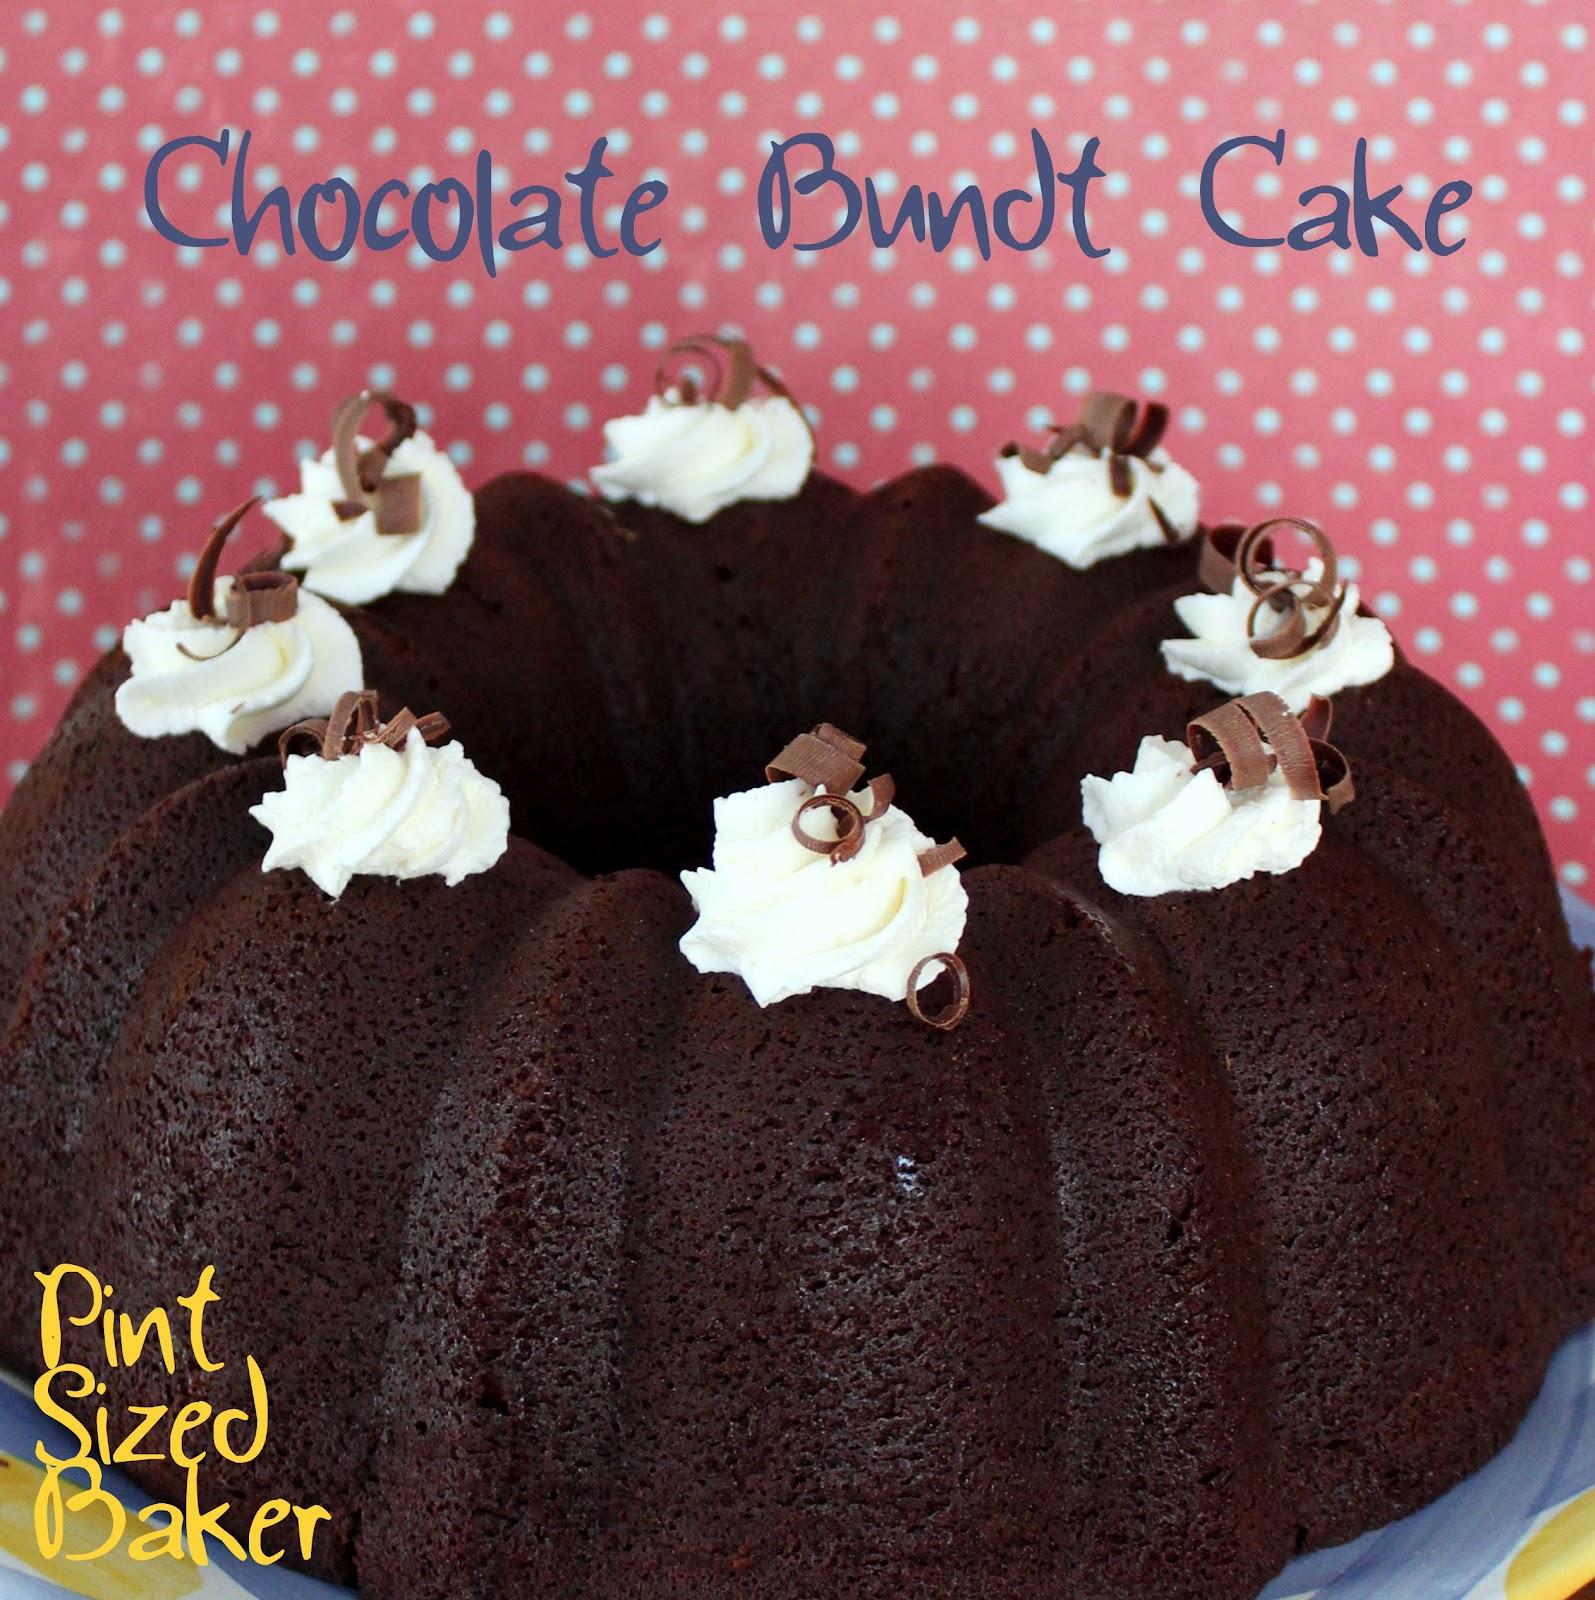 Pint Sized Baker: Chocolate Sour Cream Bundt Cake